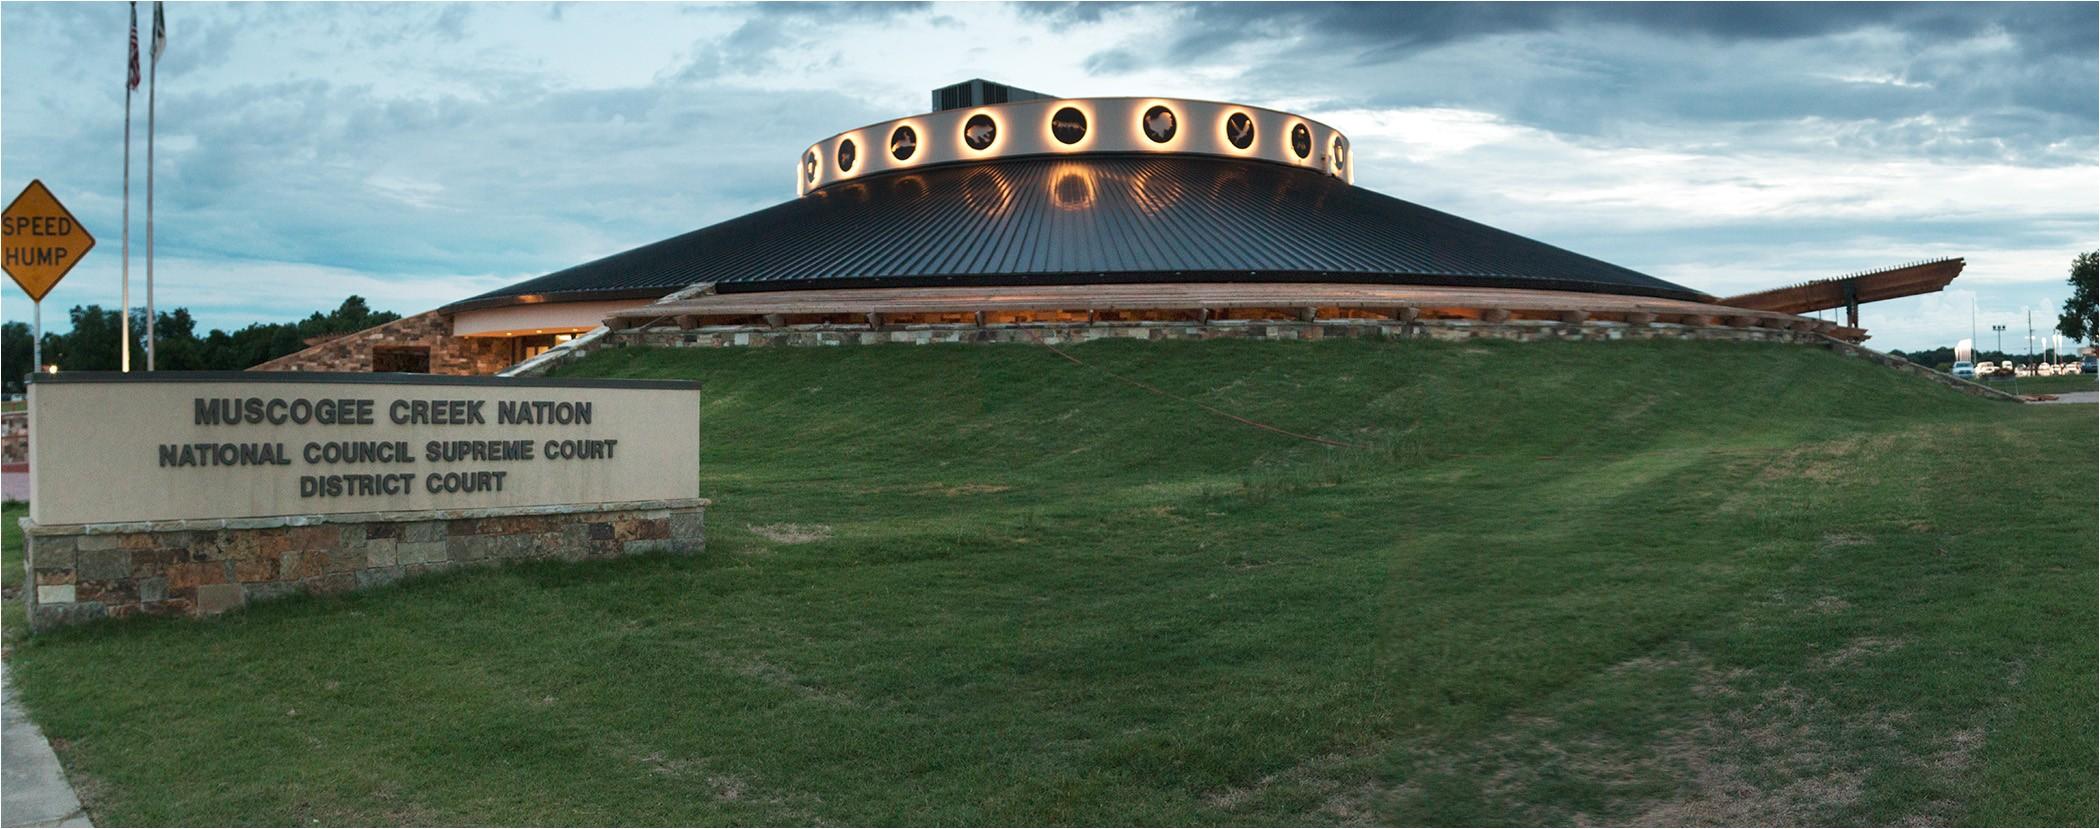 Muscogee Creek Nation Okmulgee Ok Home New Muscogee Creek Nation